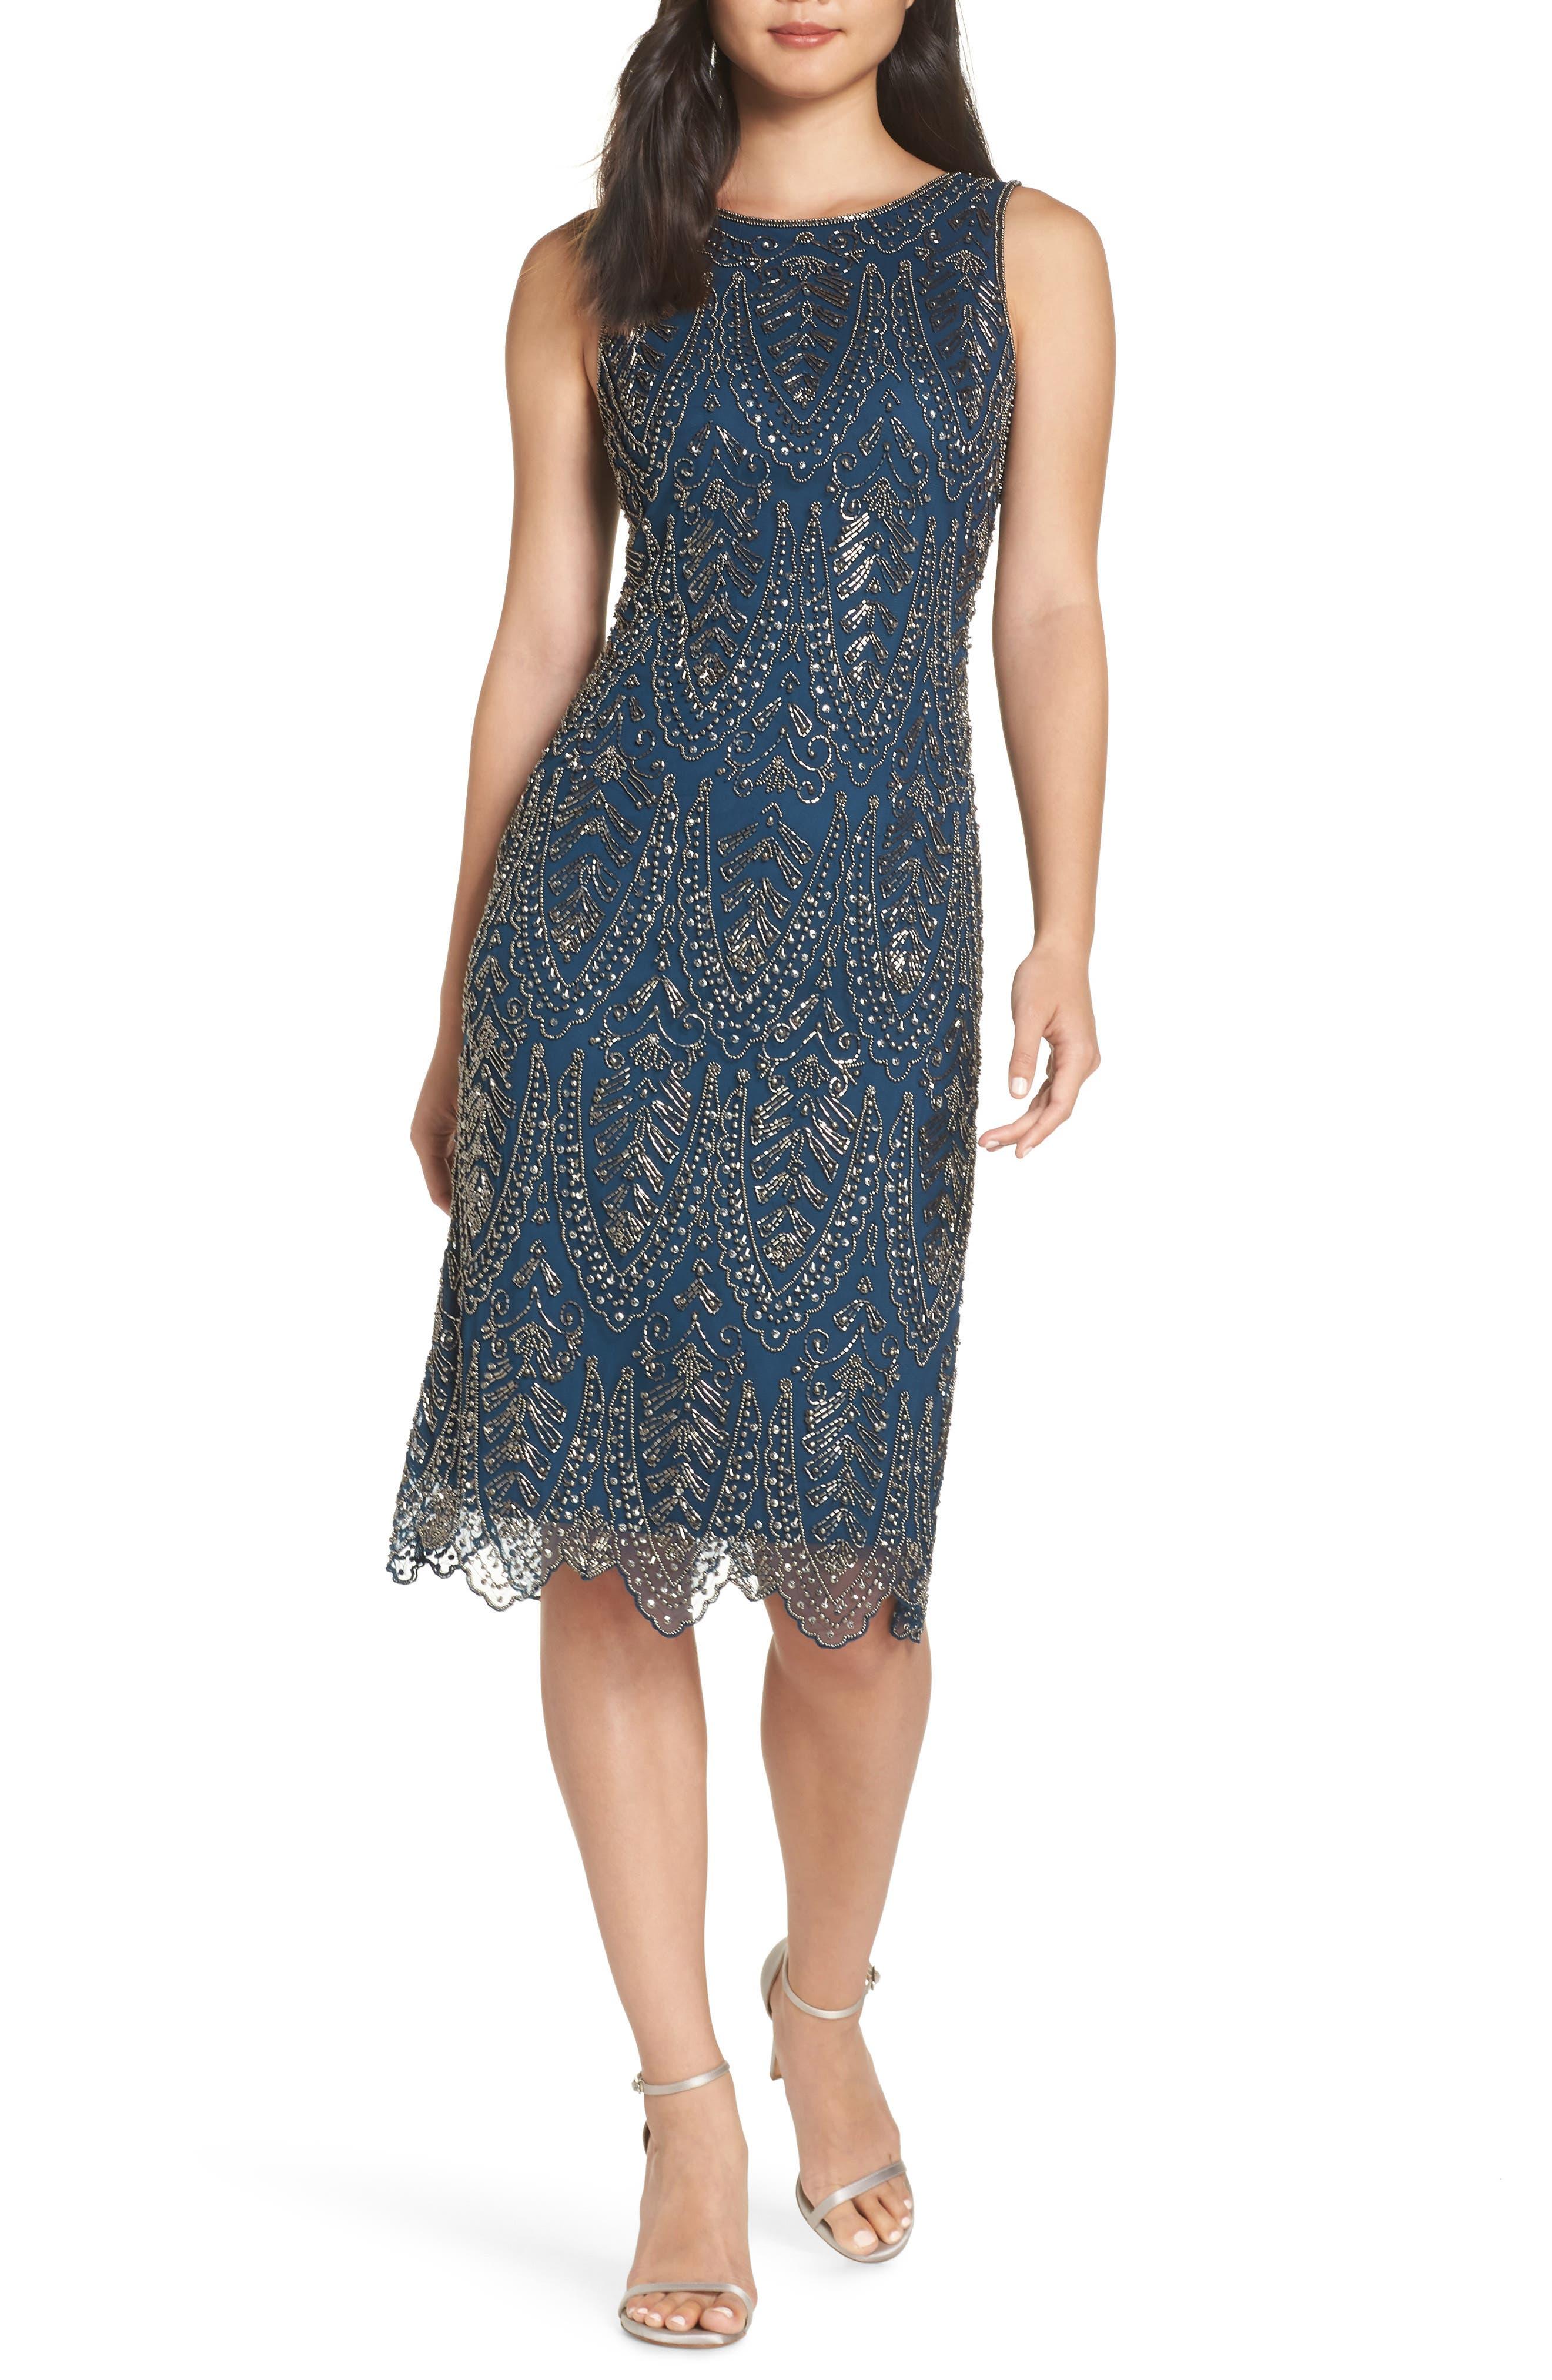 PISARRO NIGHTS, Middy Zigzag Sheath Dress, Main thumbnail 1, color, 400